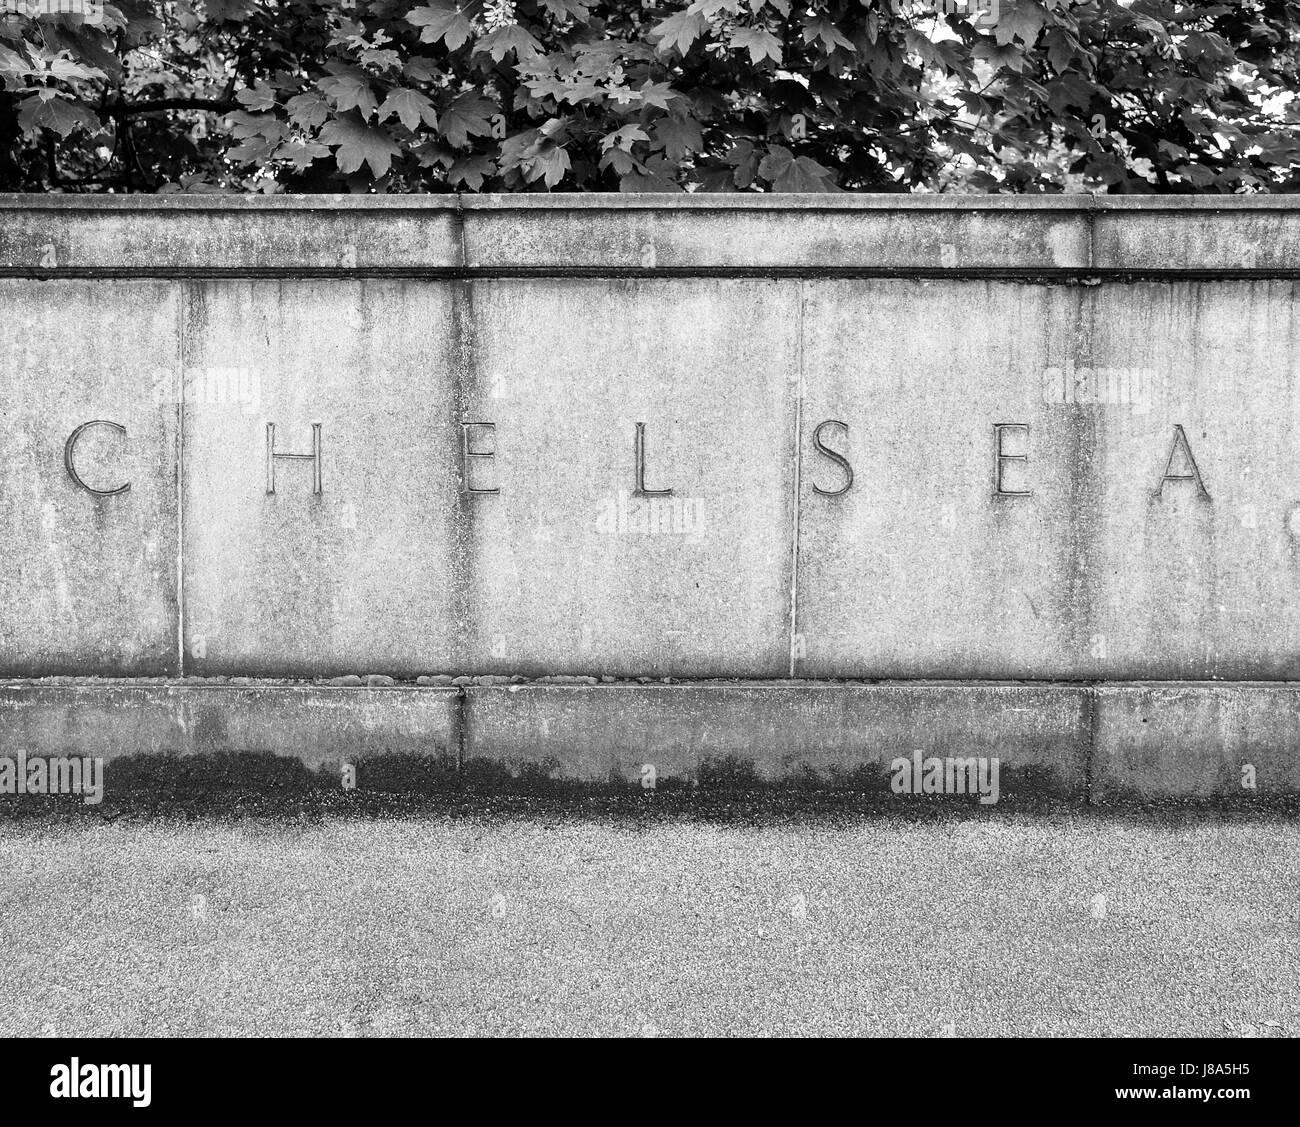 bridge, london, england, british, britain, english, landmark, stone, bridge, - Stock Image